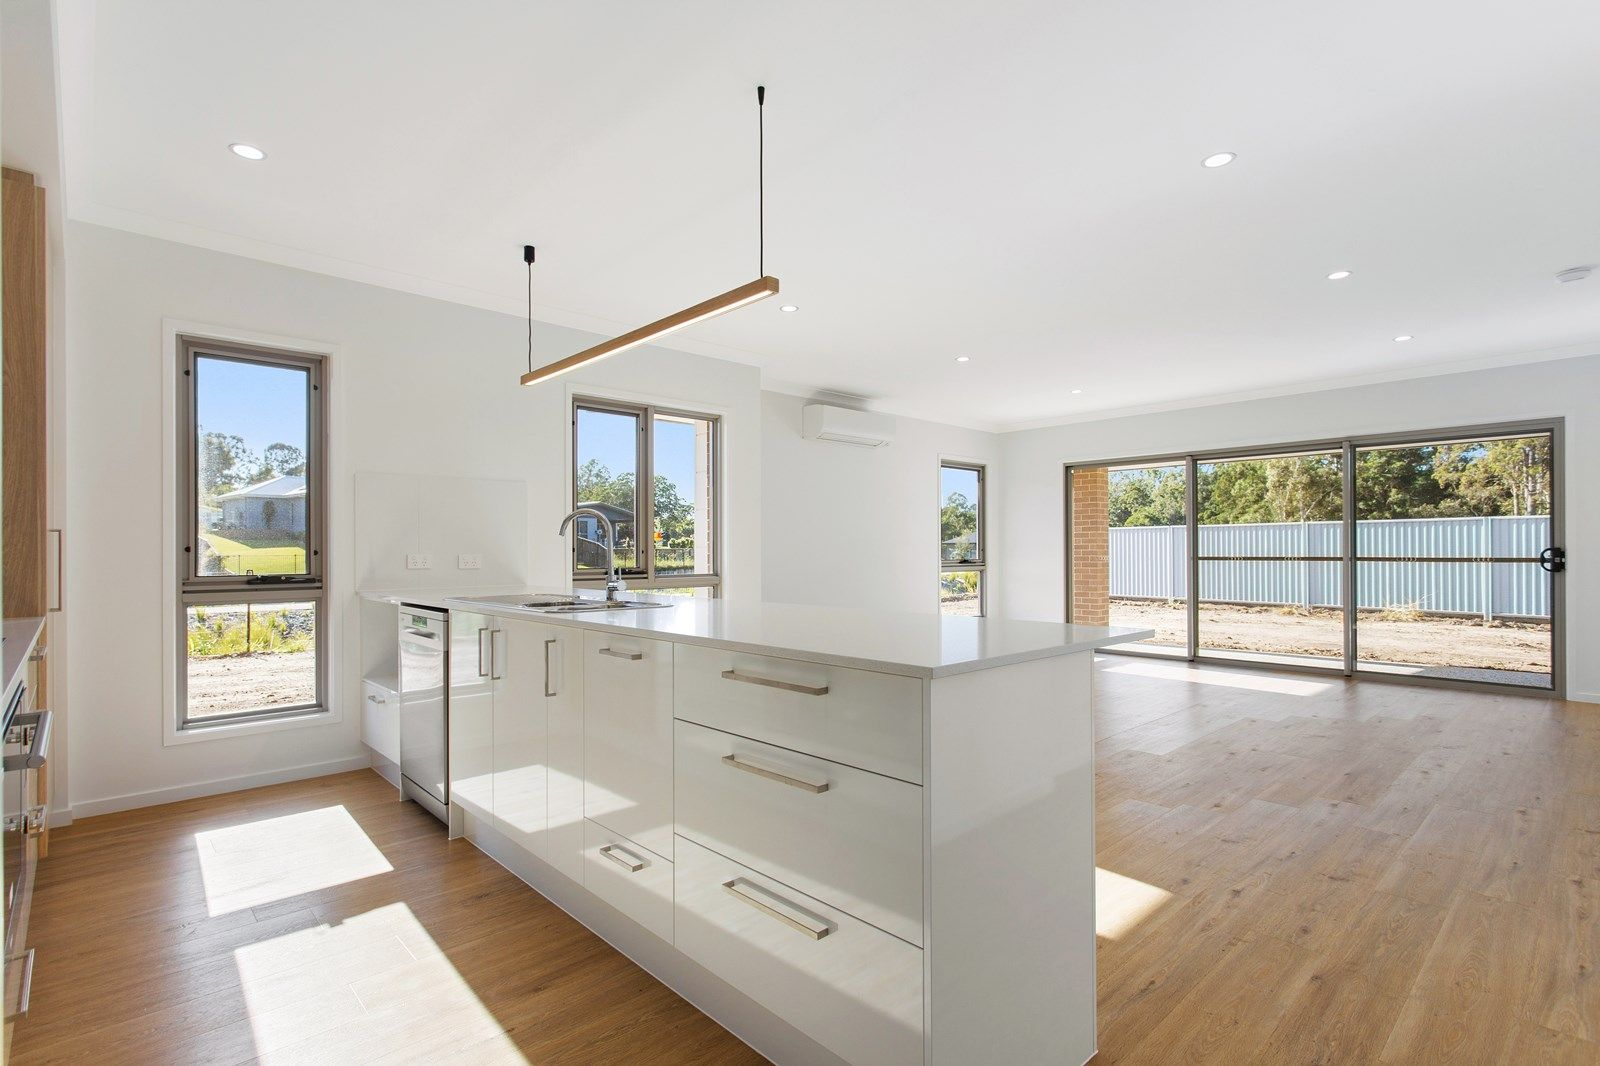 Lot 6 Cedarwood Place, Landsborough QLD 4550, Image 1